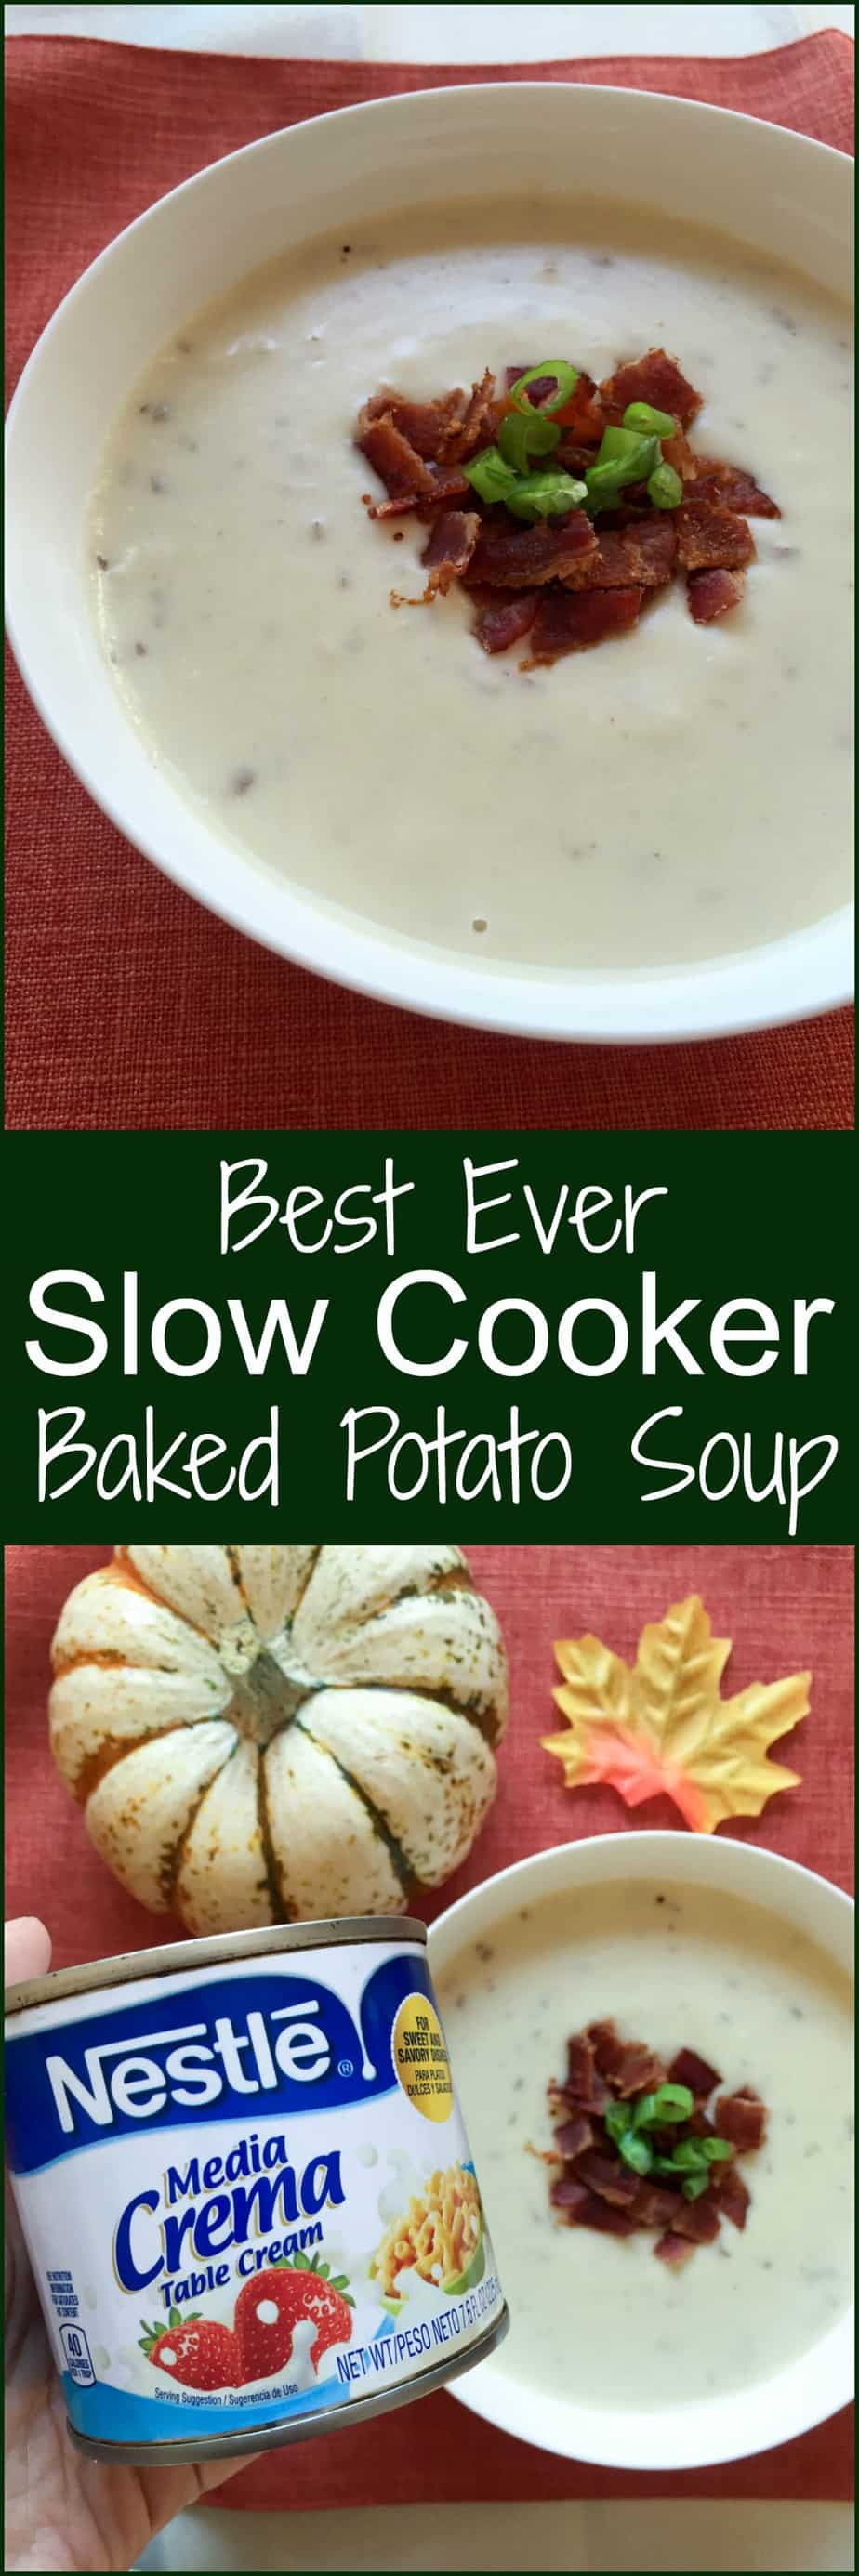 nestle slow cooker baked potato soup